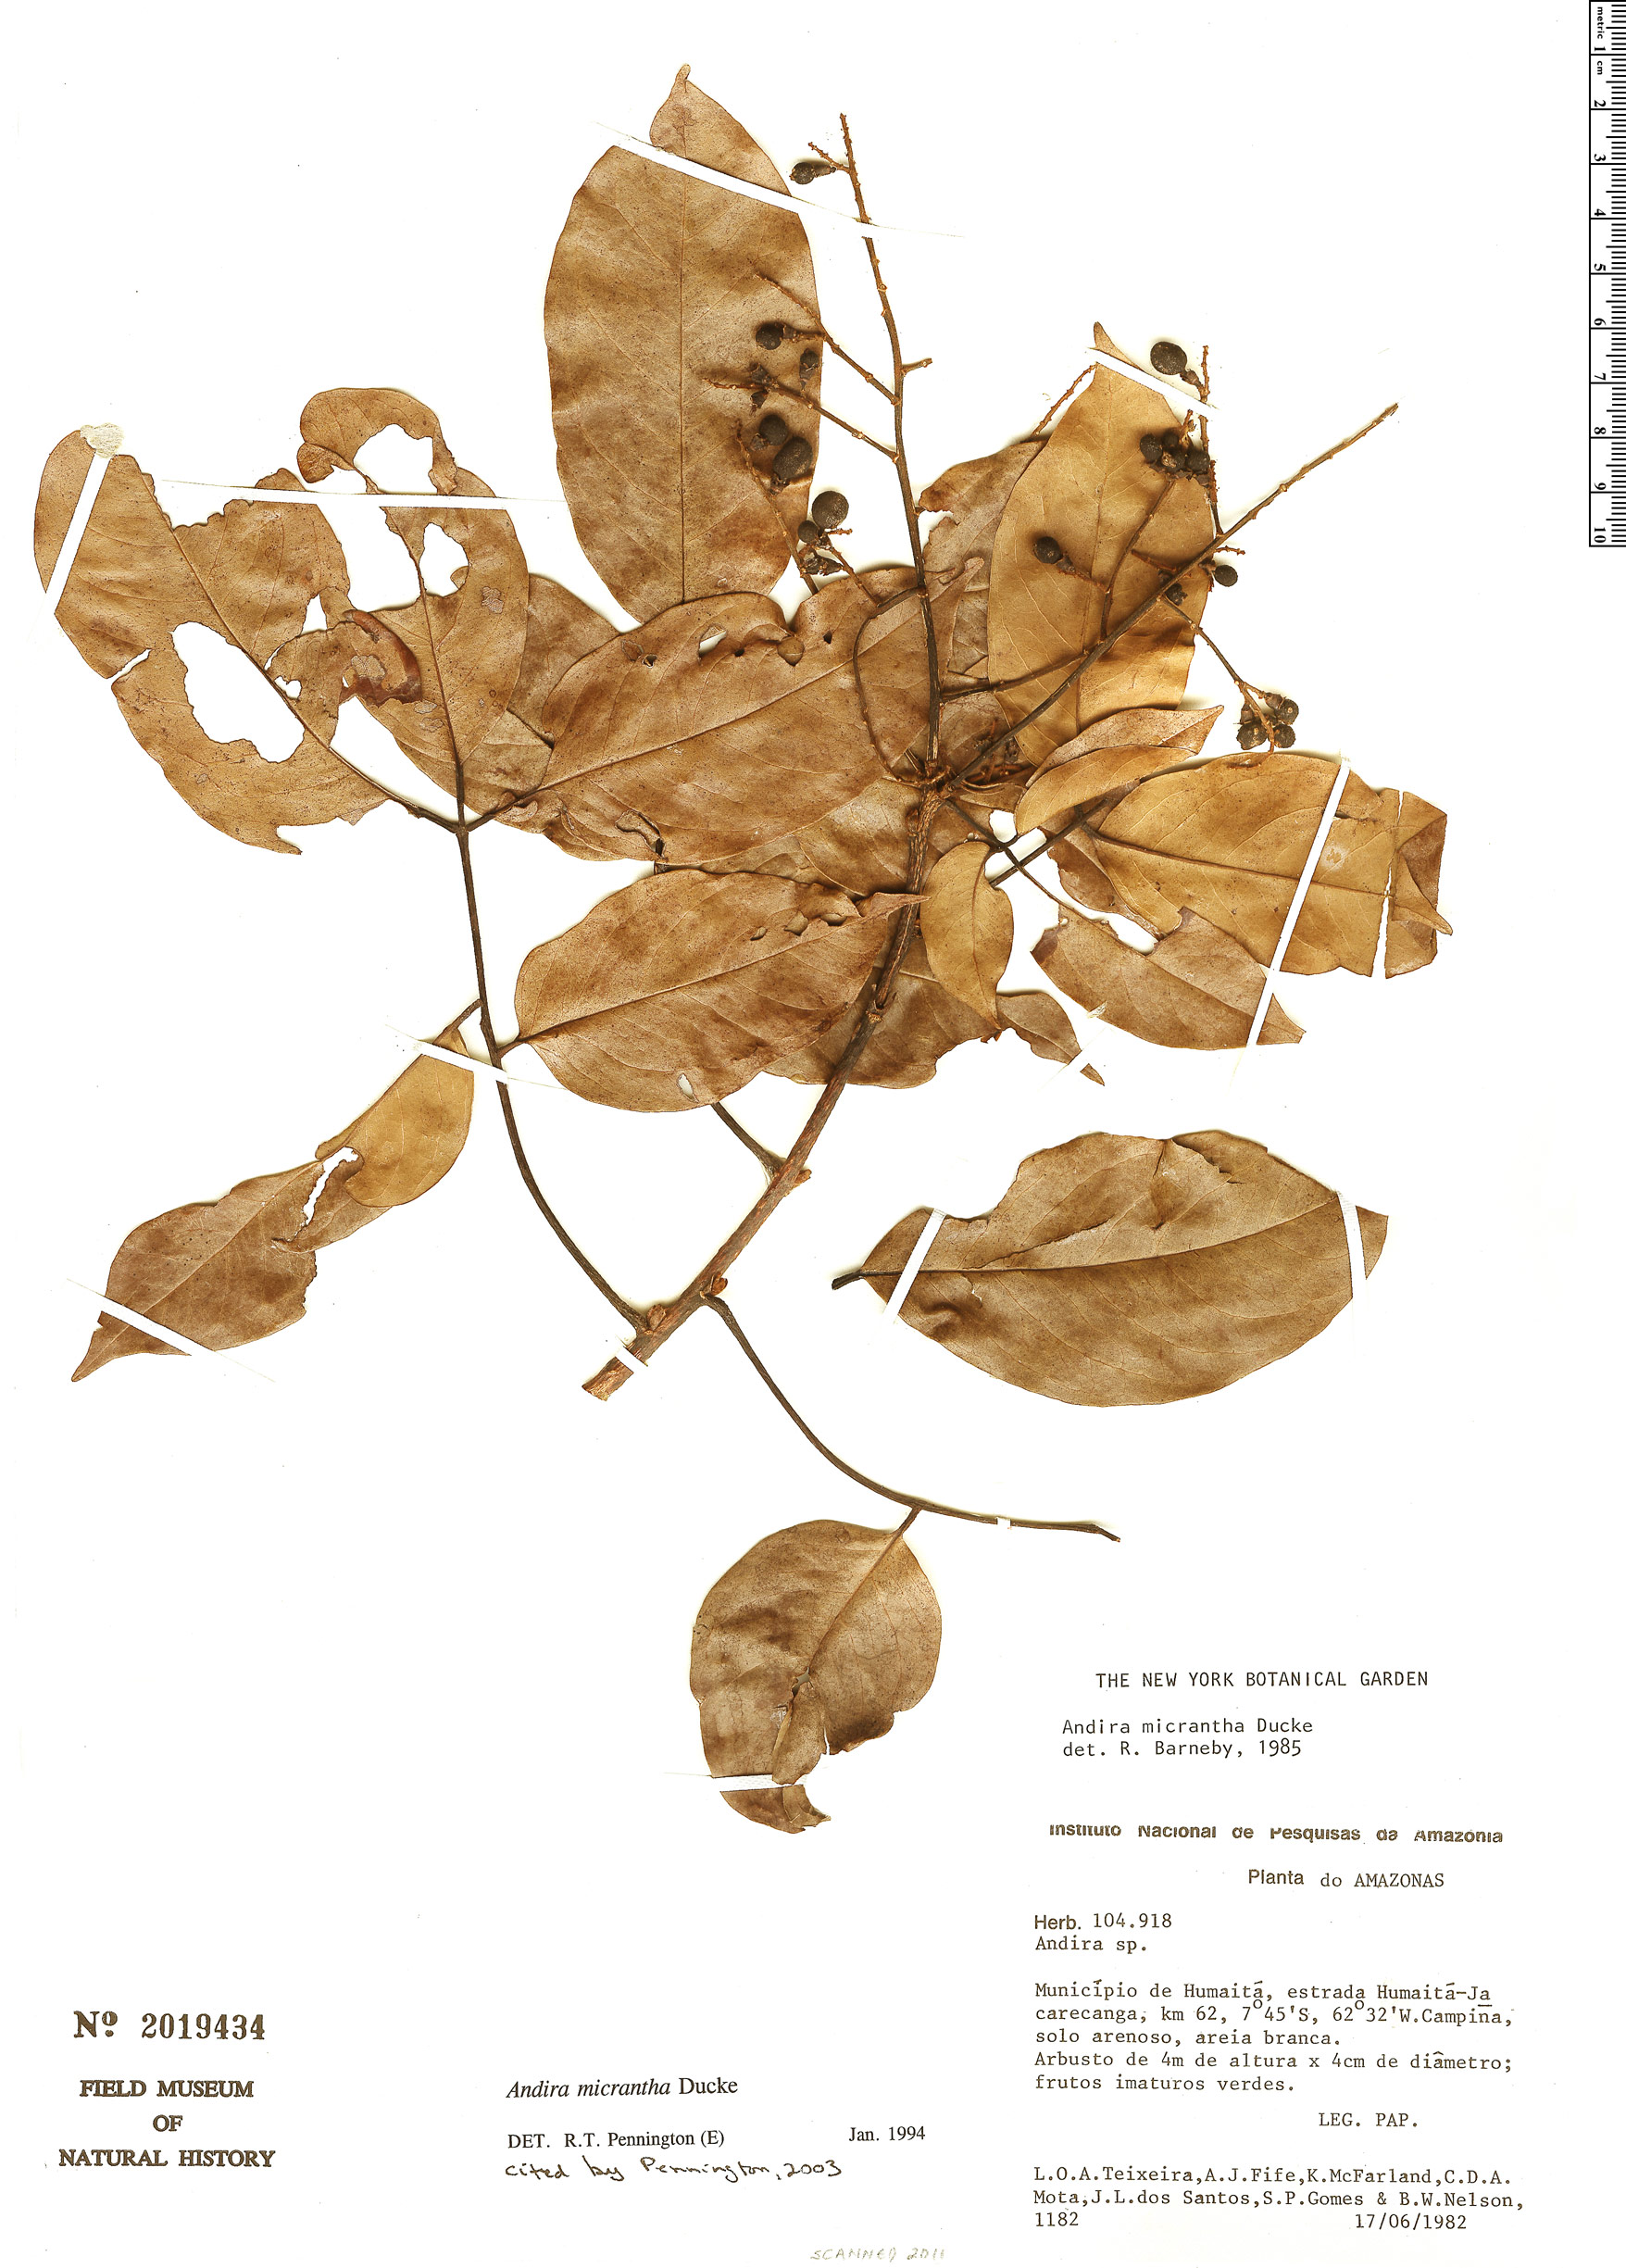 Specimen: Andira micrantha